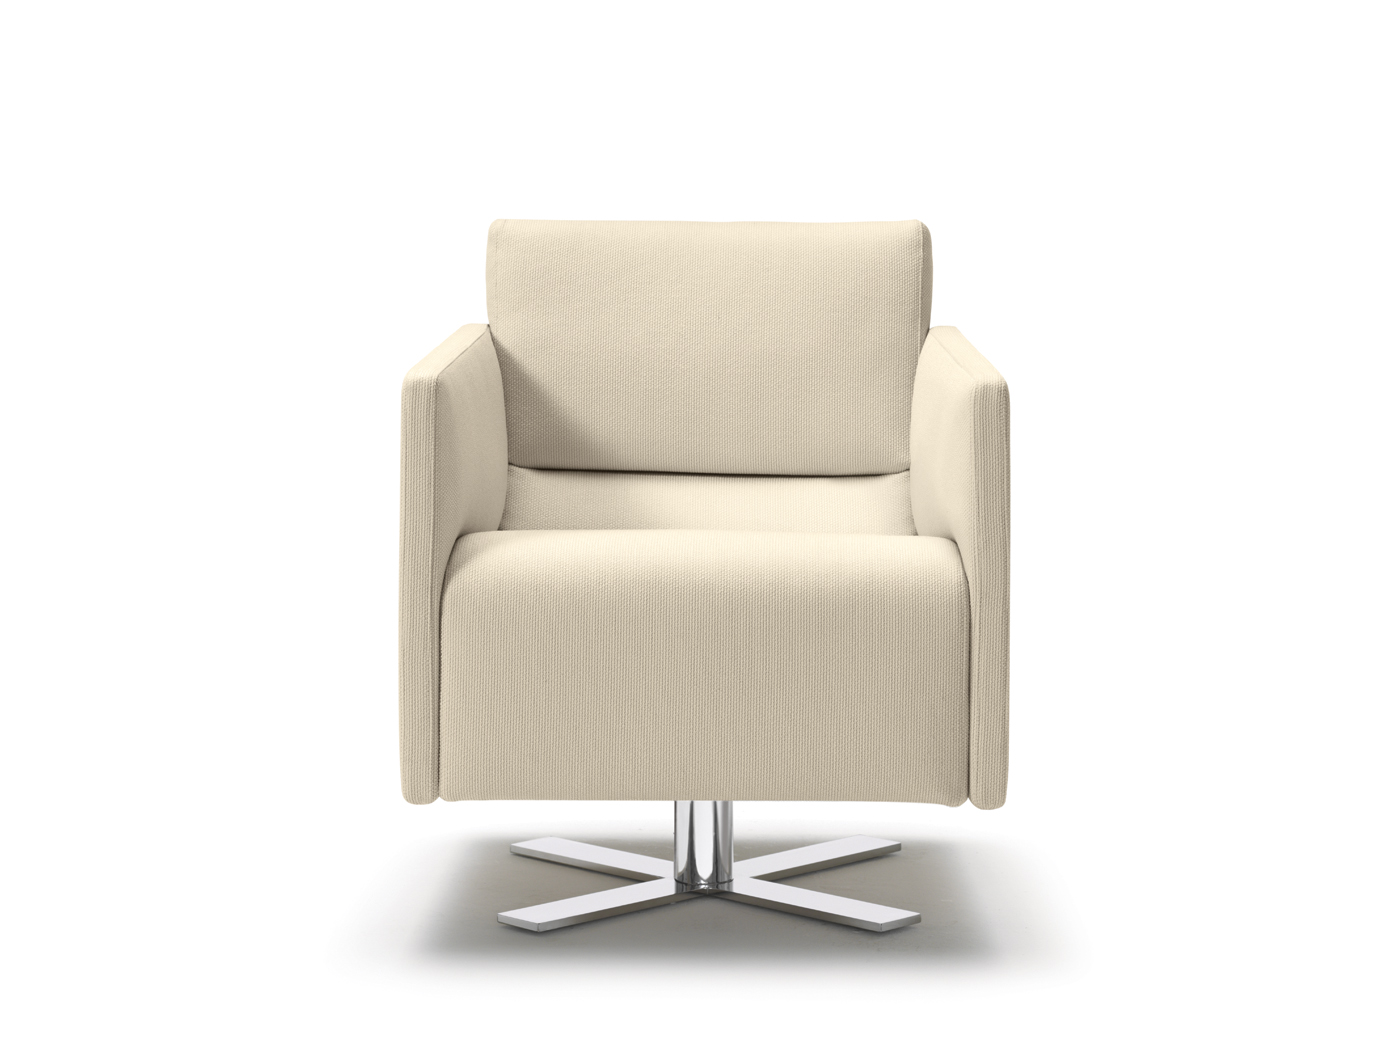 rawi sessel professional cor. Black Bedroom Furniture Sets. Home Design Ideas